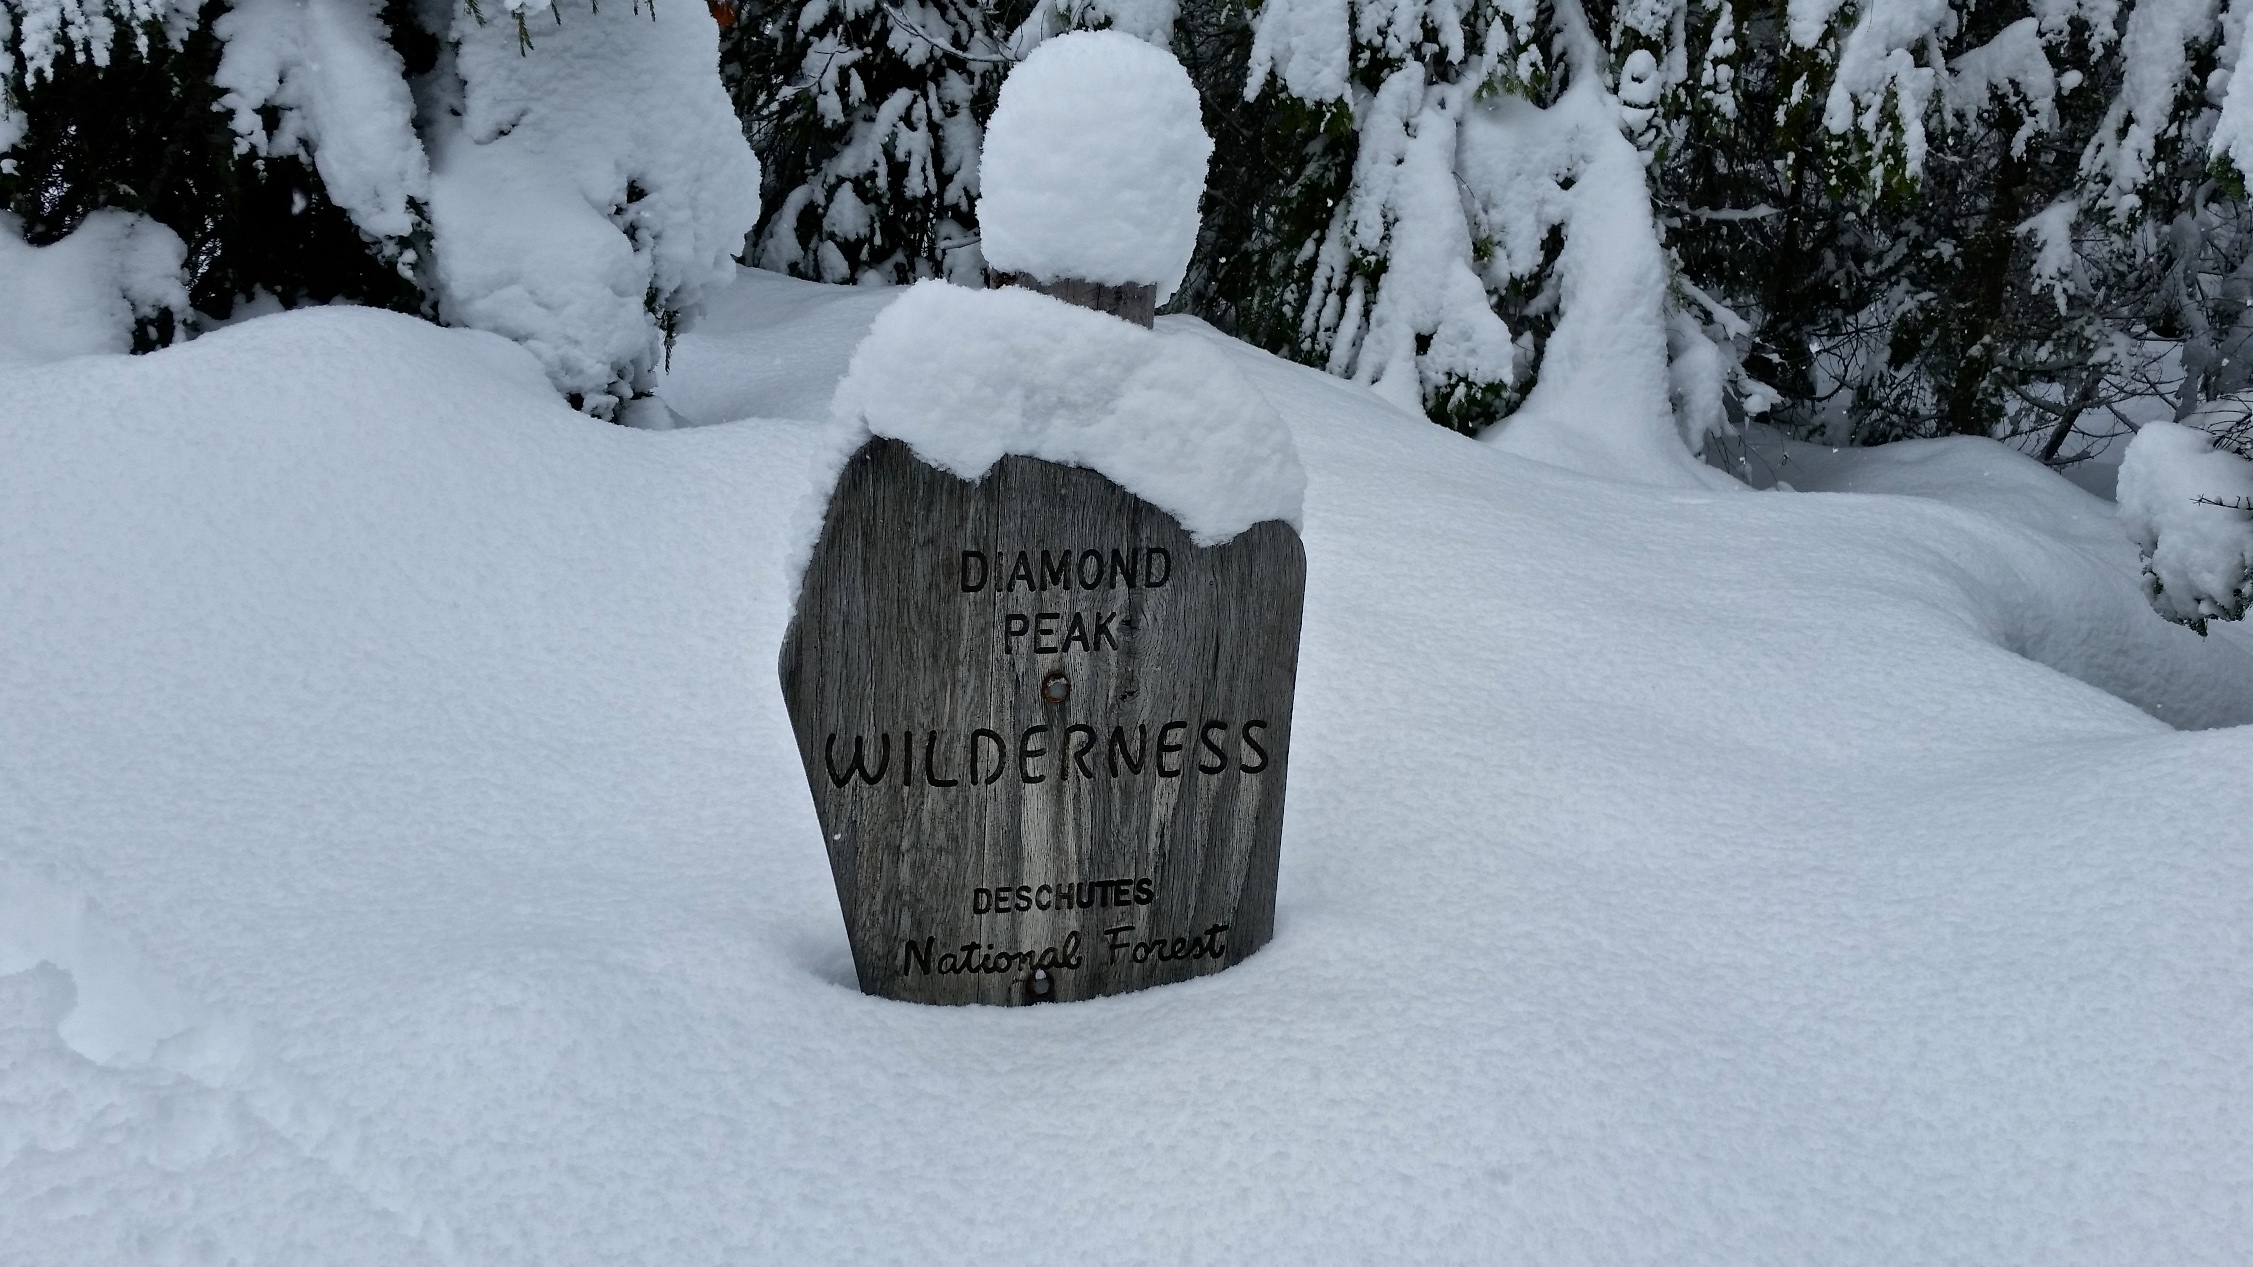 Diamond Peak Wilderness